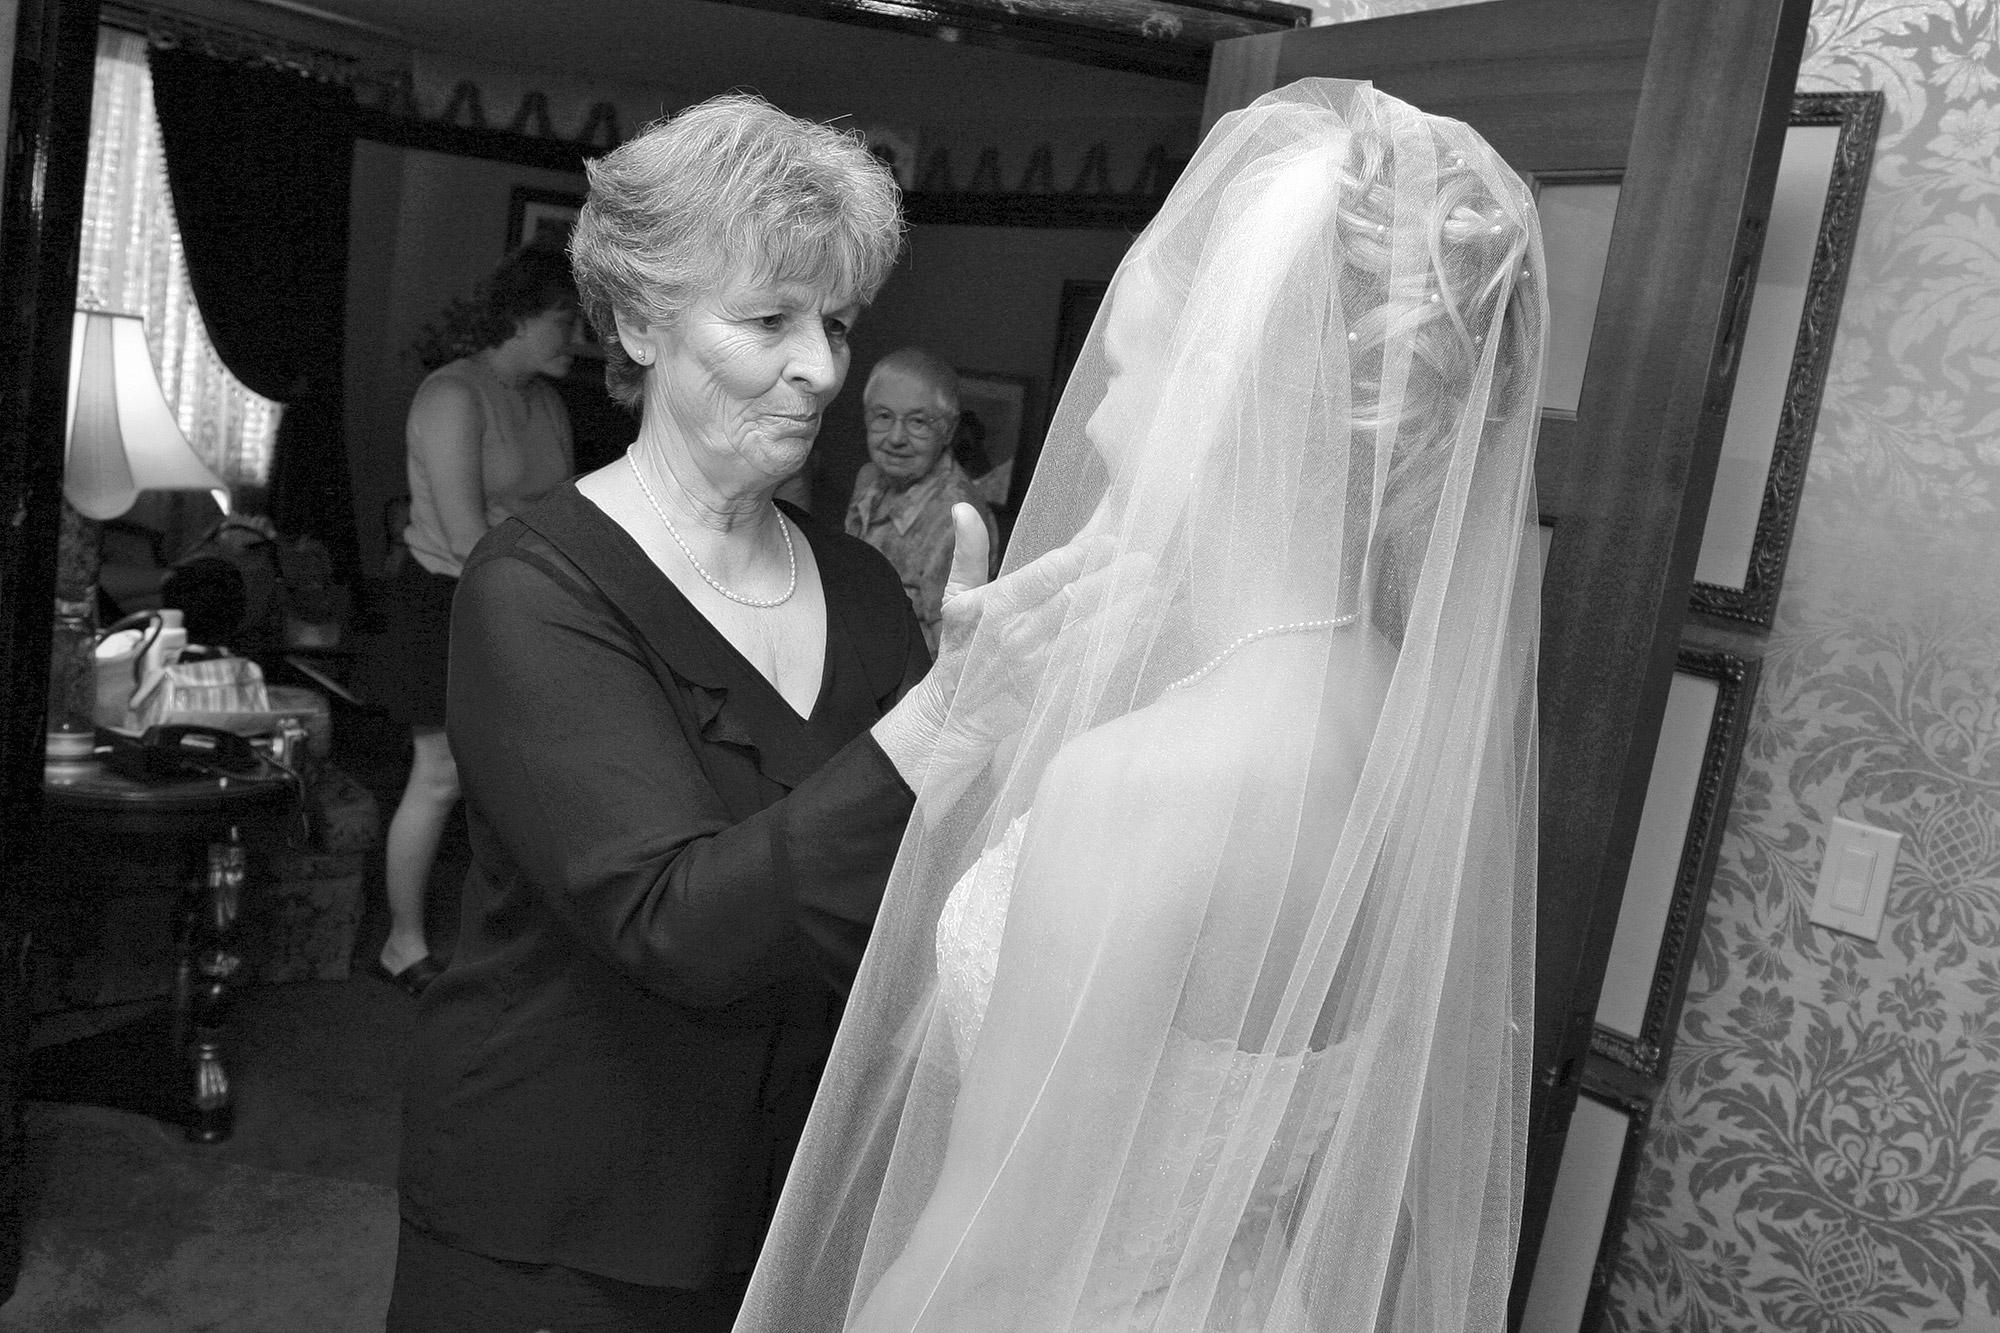 minneapolis-wedding-photography-mark-kegans-338.jpg